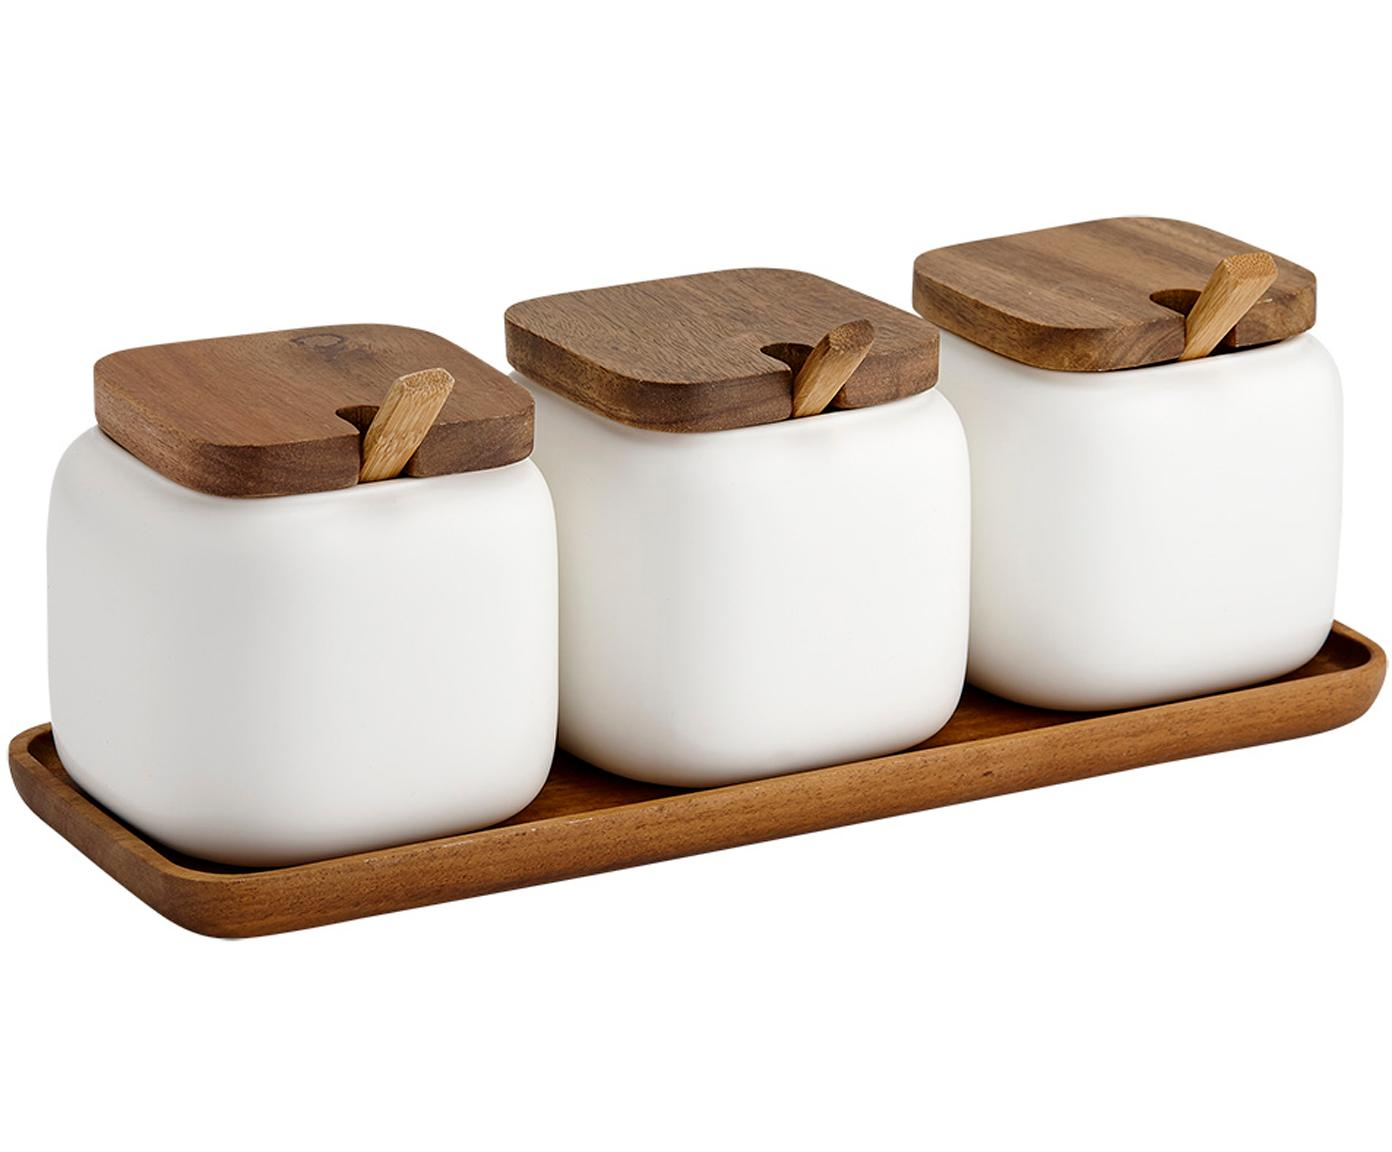 Set contenitori in porcellana e legno di acacia Essentials 7 pz, Porcellana, legno d'acacia, Sabbia, legno di acacia, Larg. 28 x Alt. 10 cm